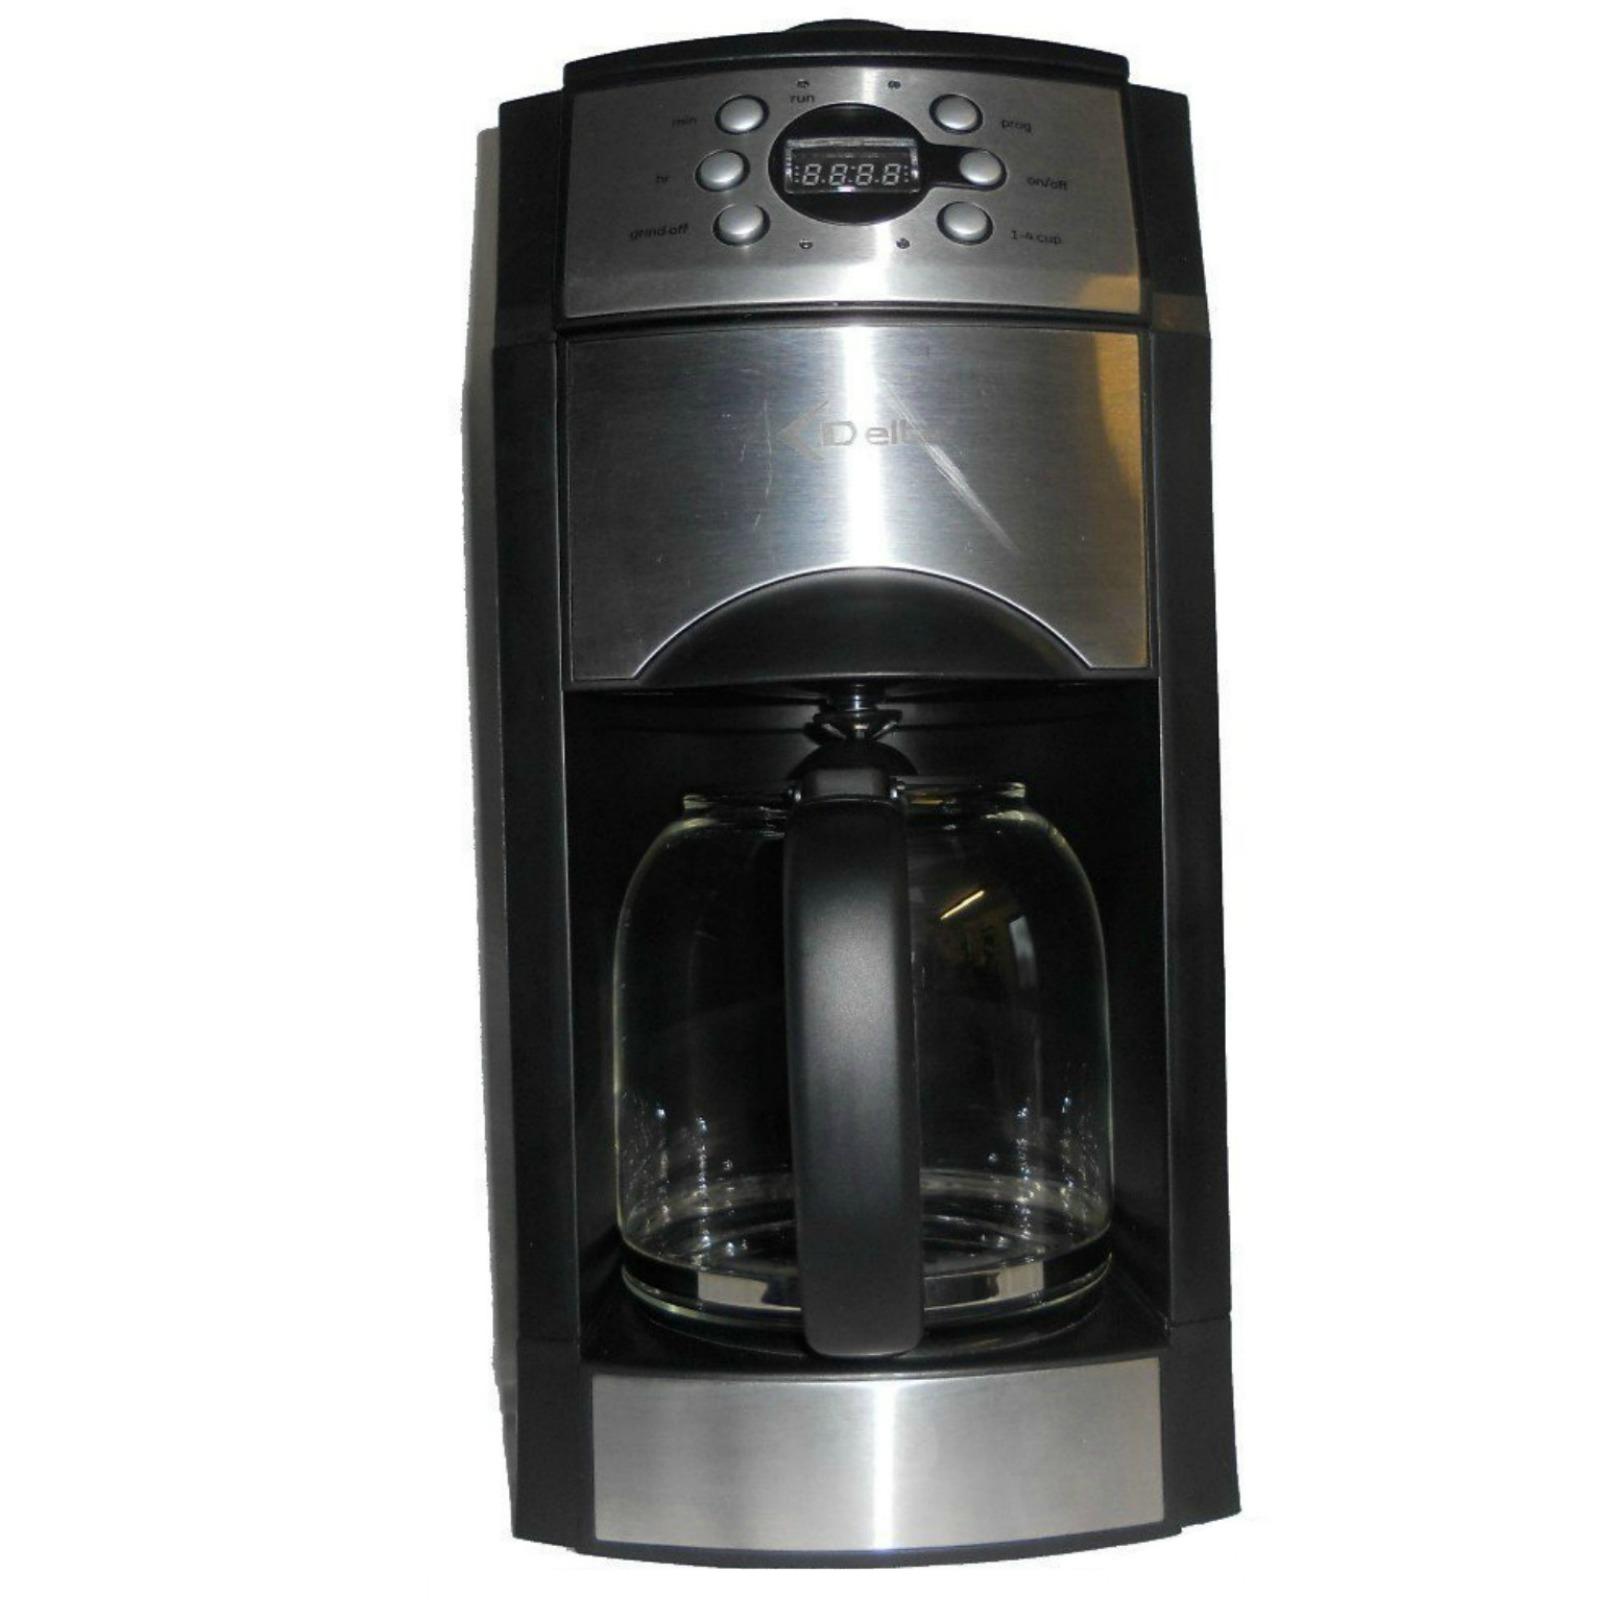 Delta Coffee Maker With Grinder : Delta ADMC4117T Coffee Maker with Grinder Silver eBay